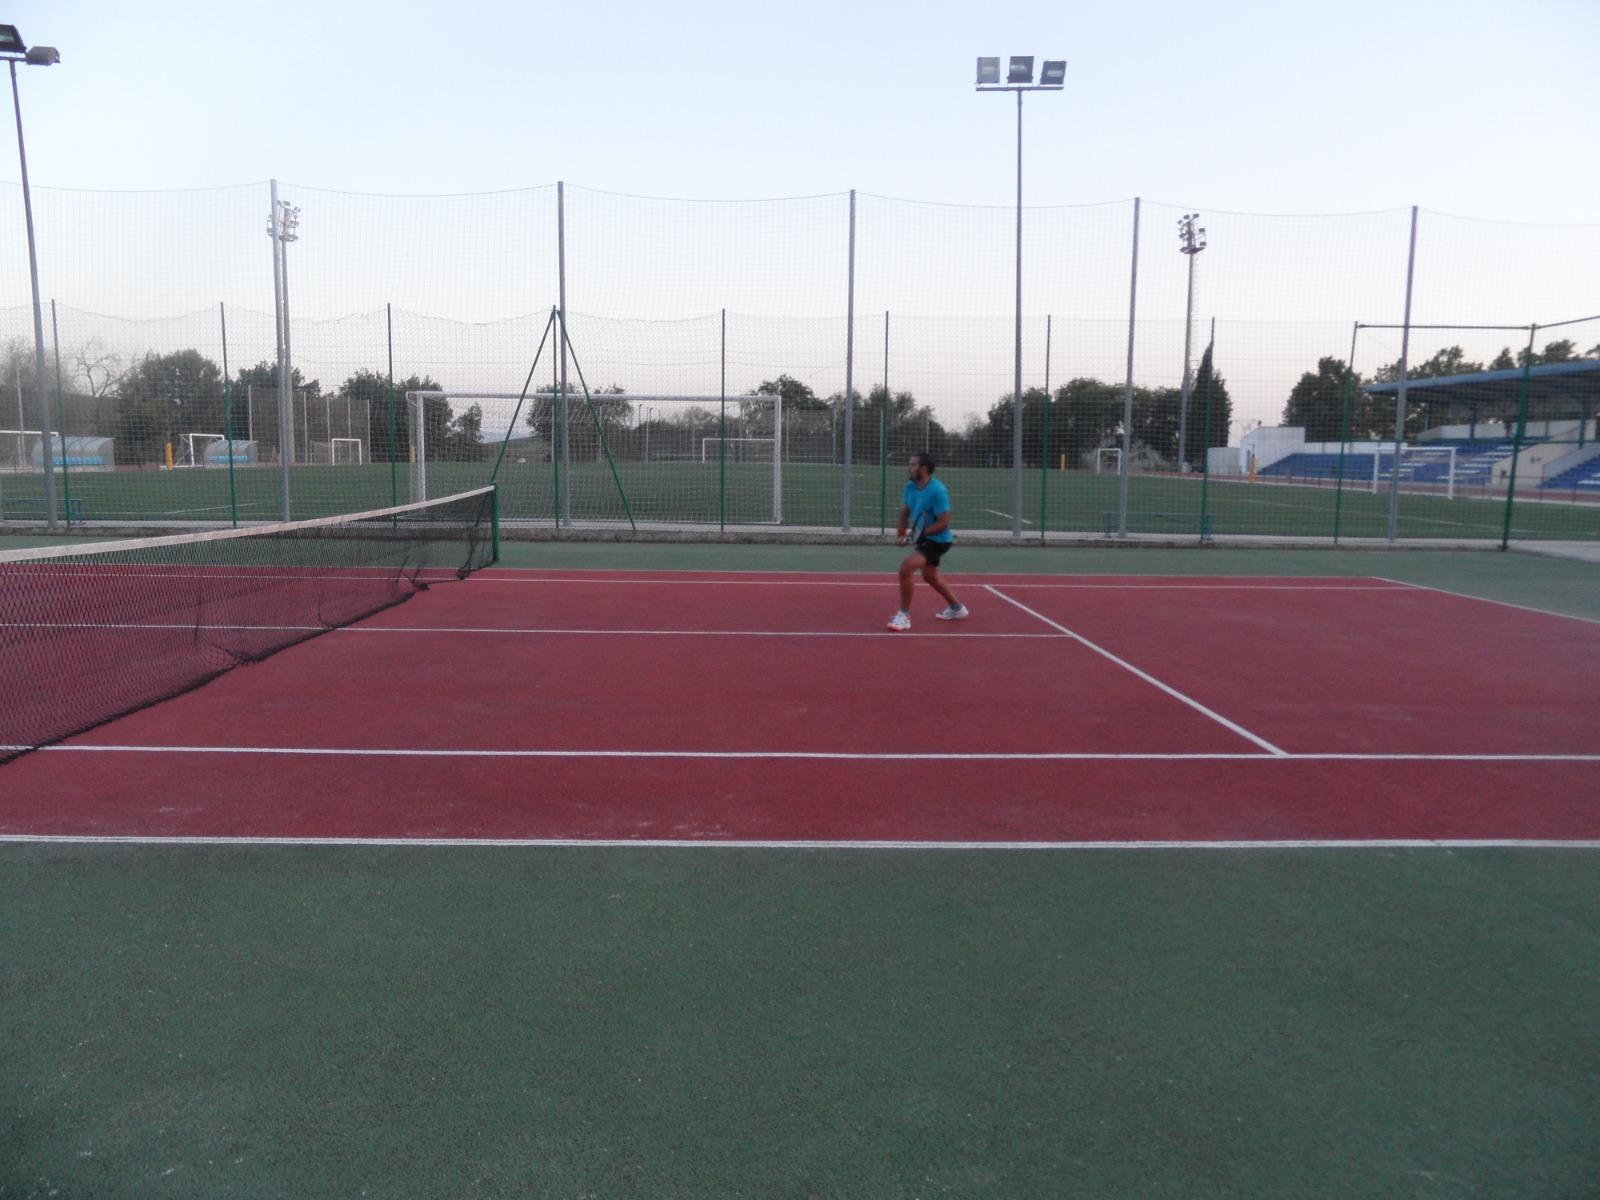 Foto de la pista de tenis